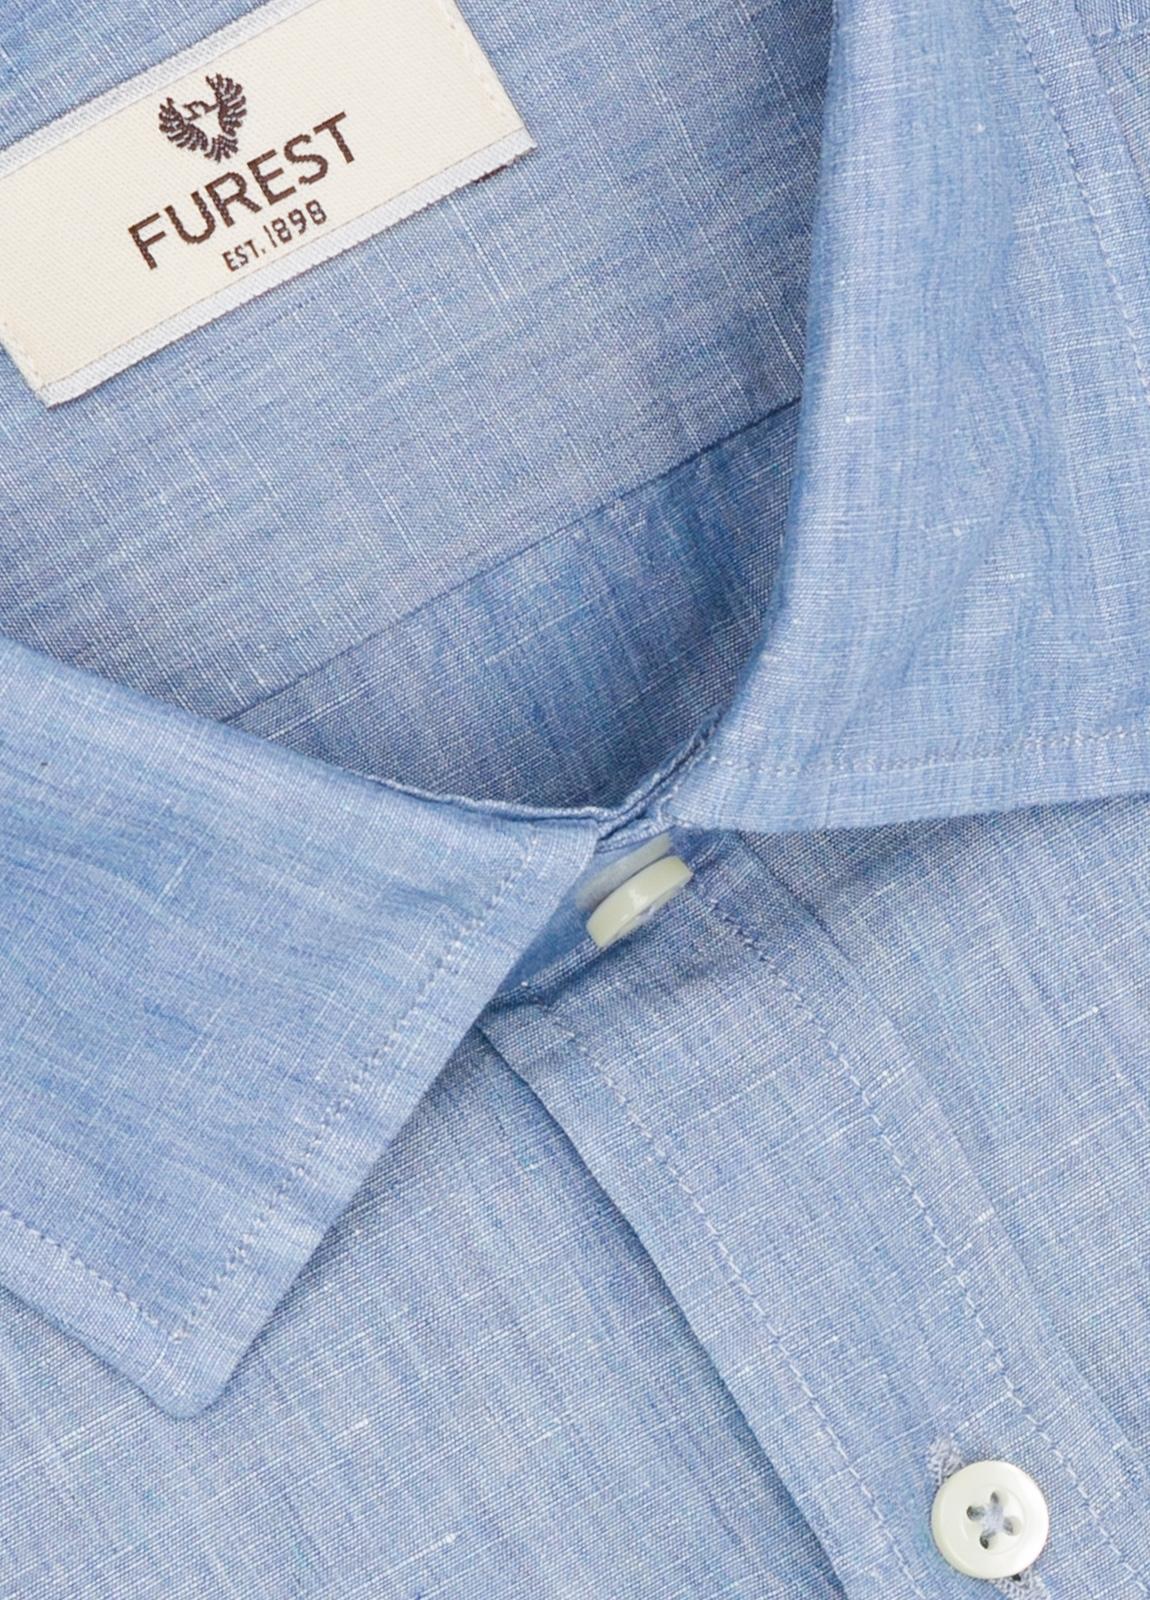 Camisa Leisure Wear SLIM FIT modelo PORTO diseño liso color azul. 100% Algodón. - Ítem1